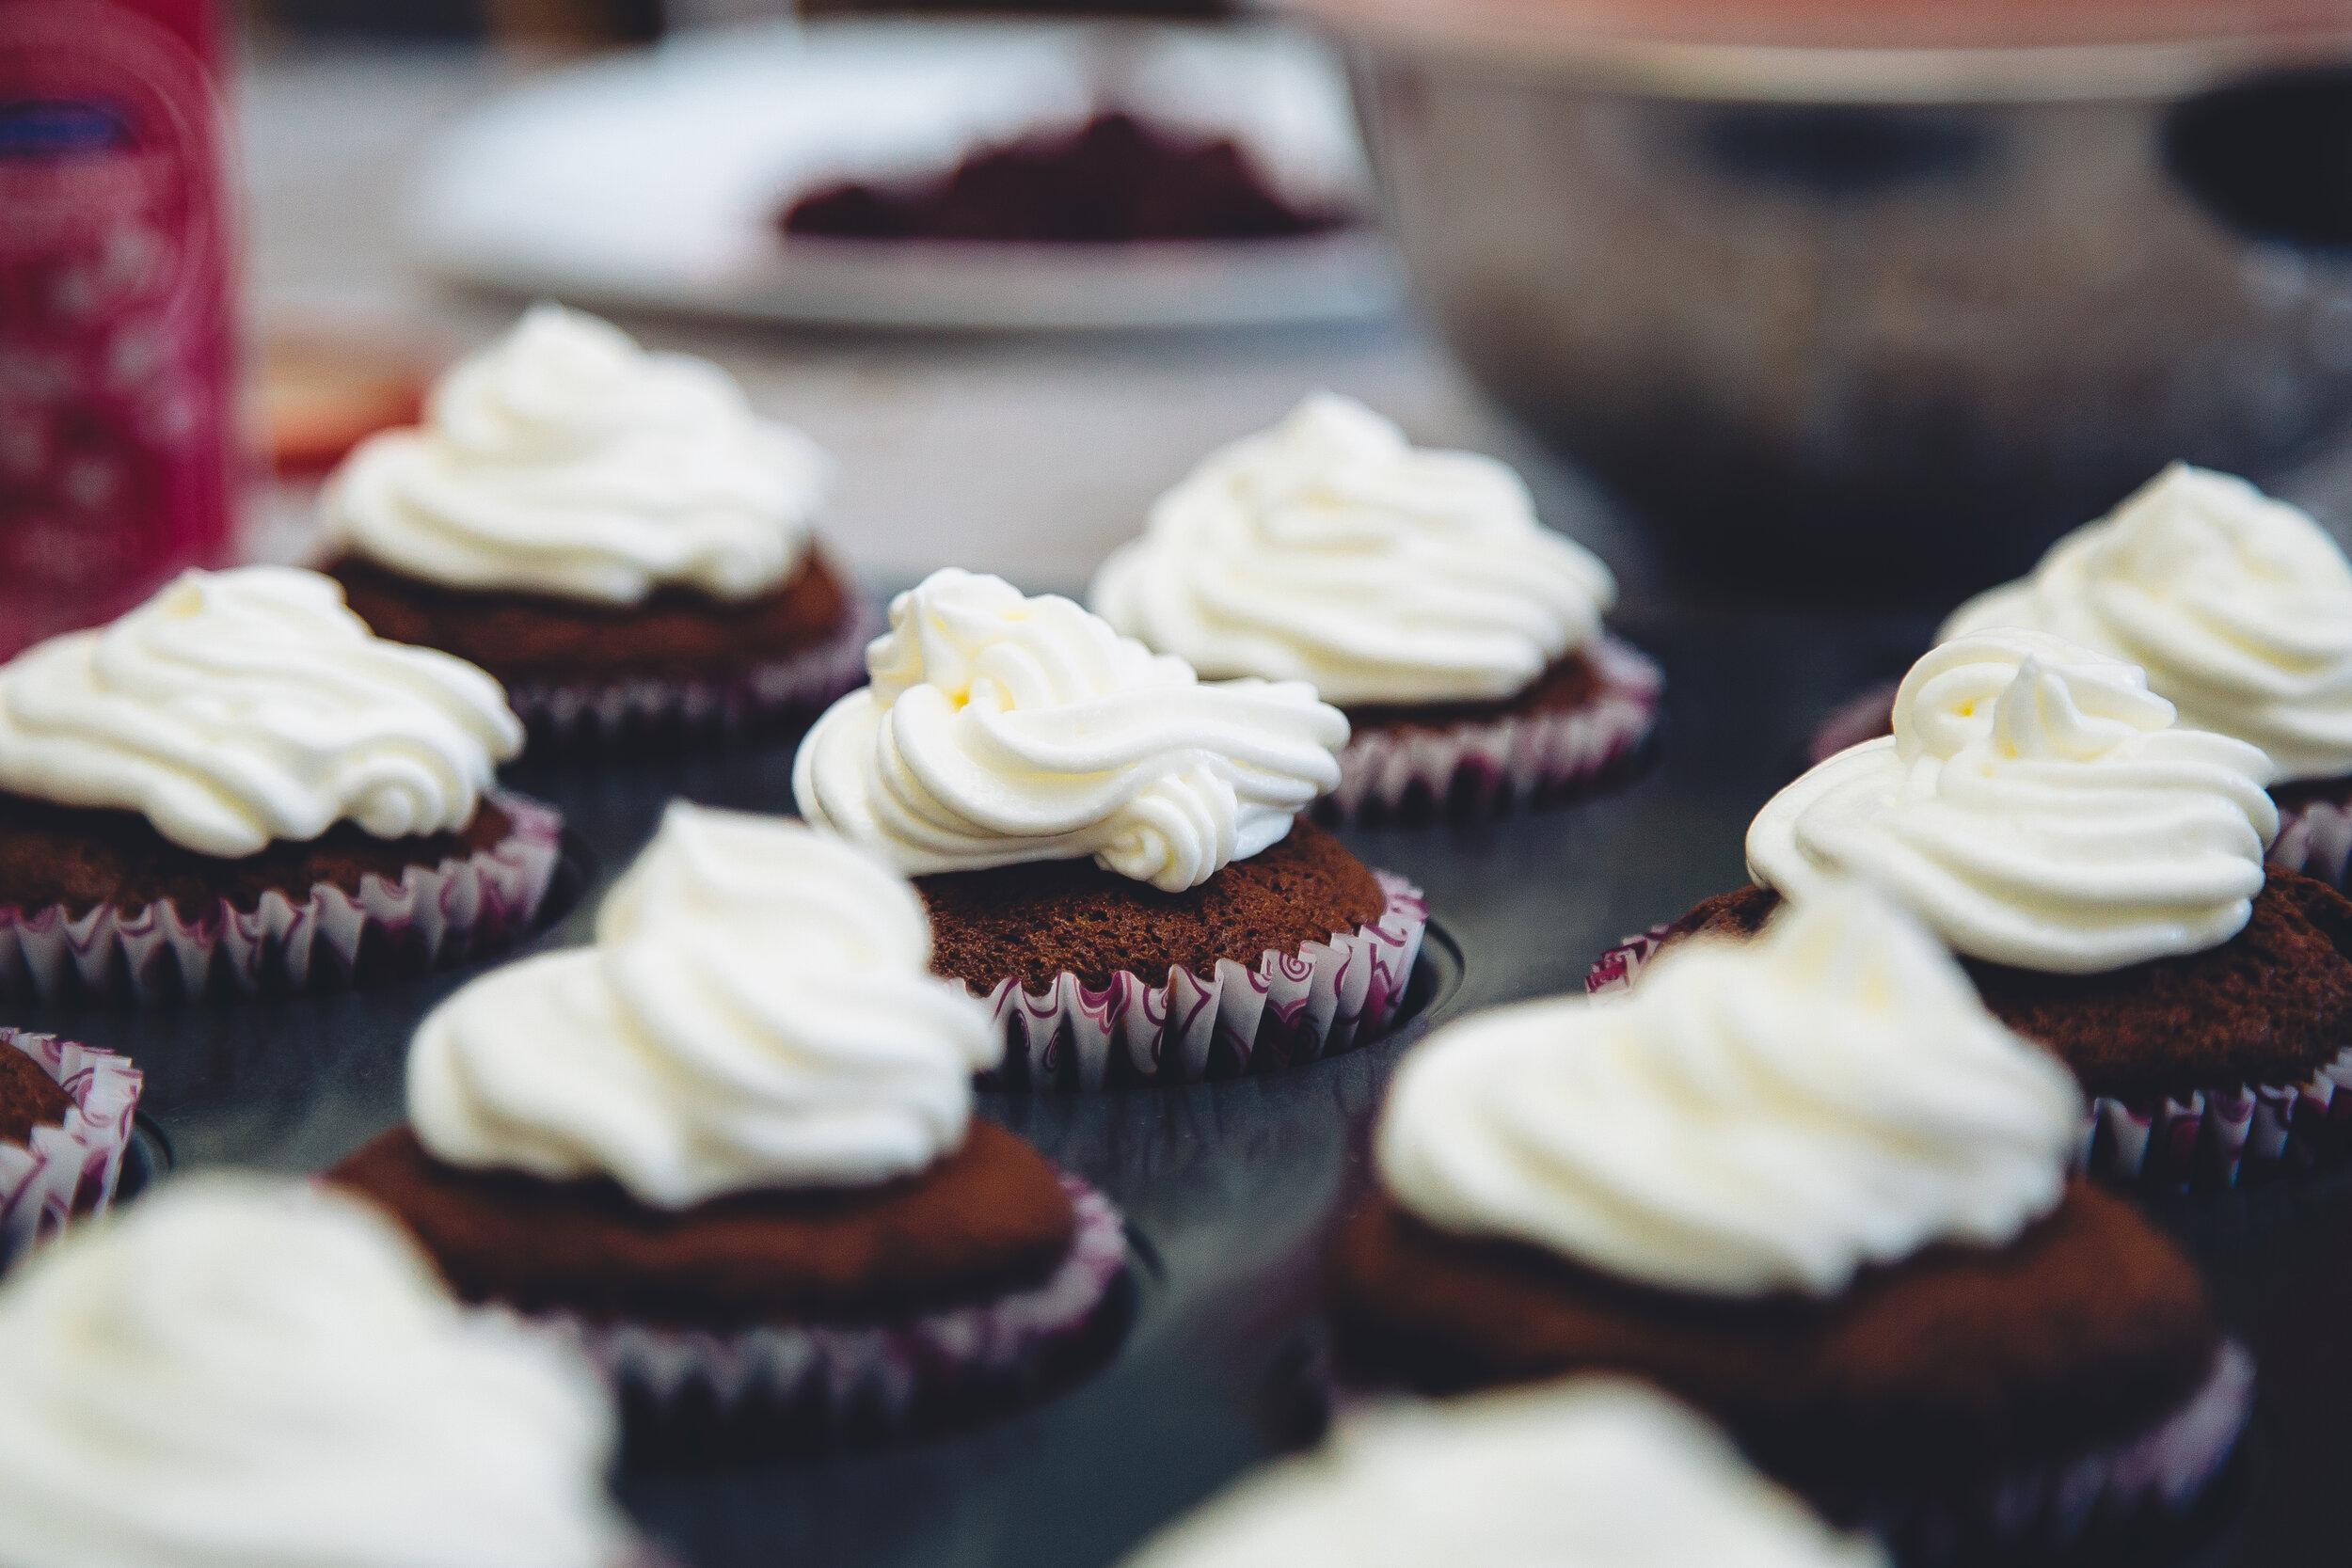 Canva - Shift-tilt Lens Photography of Cupcakes.jpg